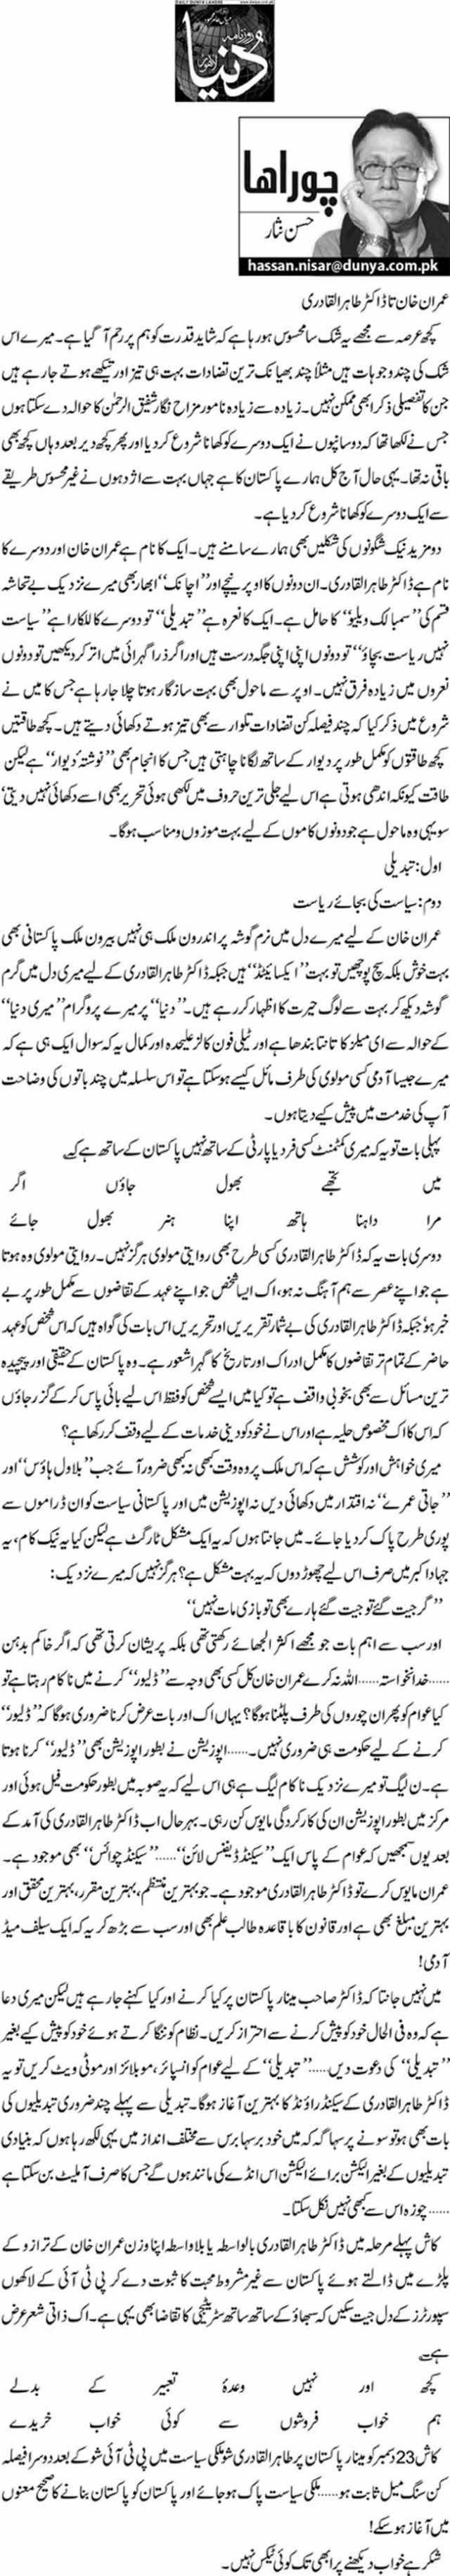 Imran Khan ta Dr. Tahir ul Qadri - Hassan Nisar